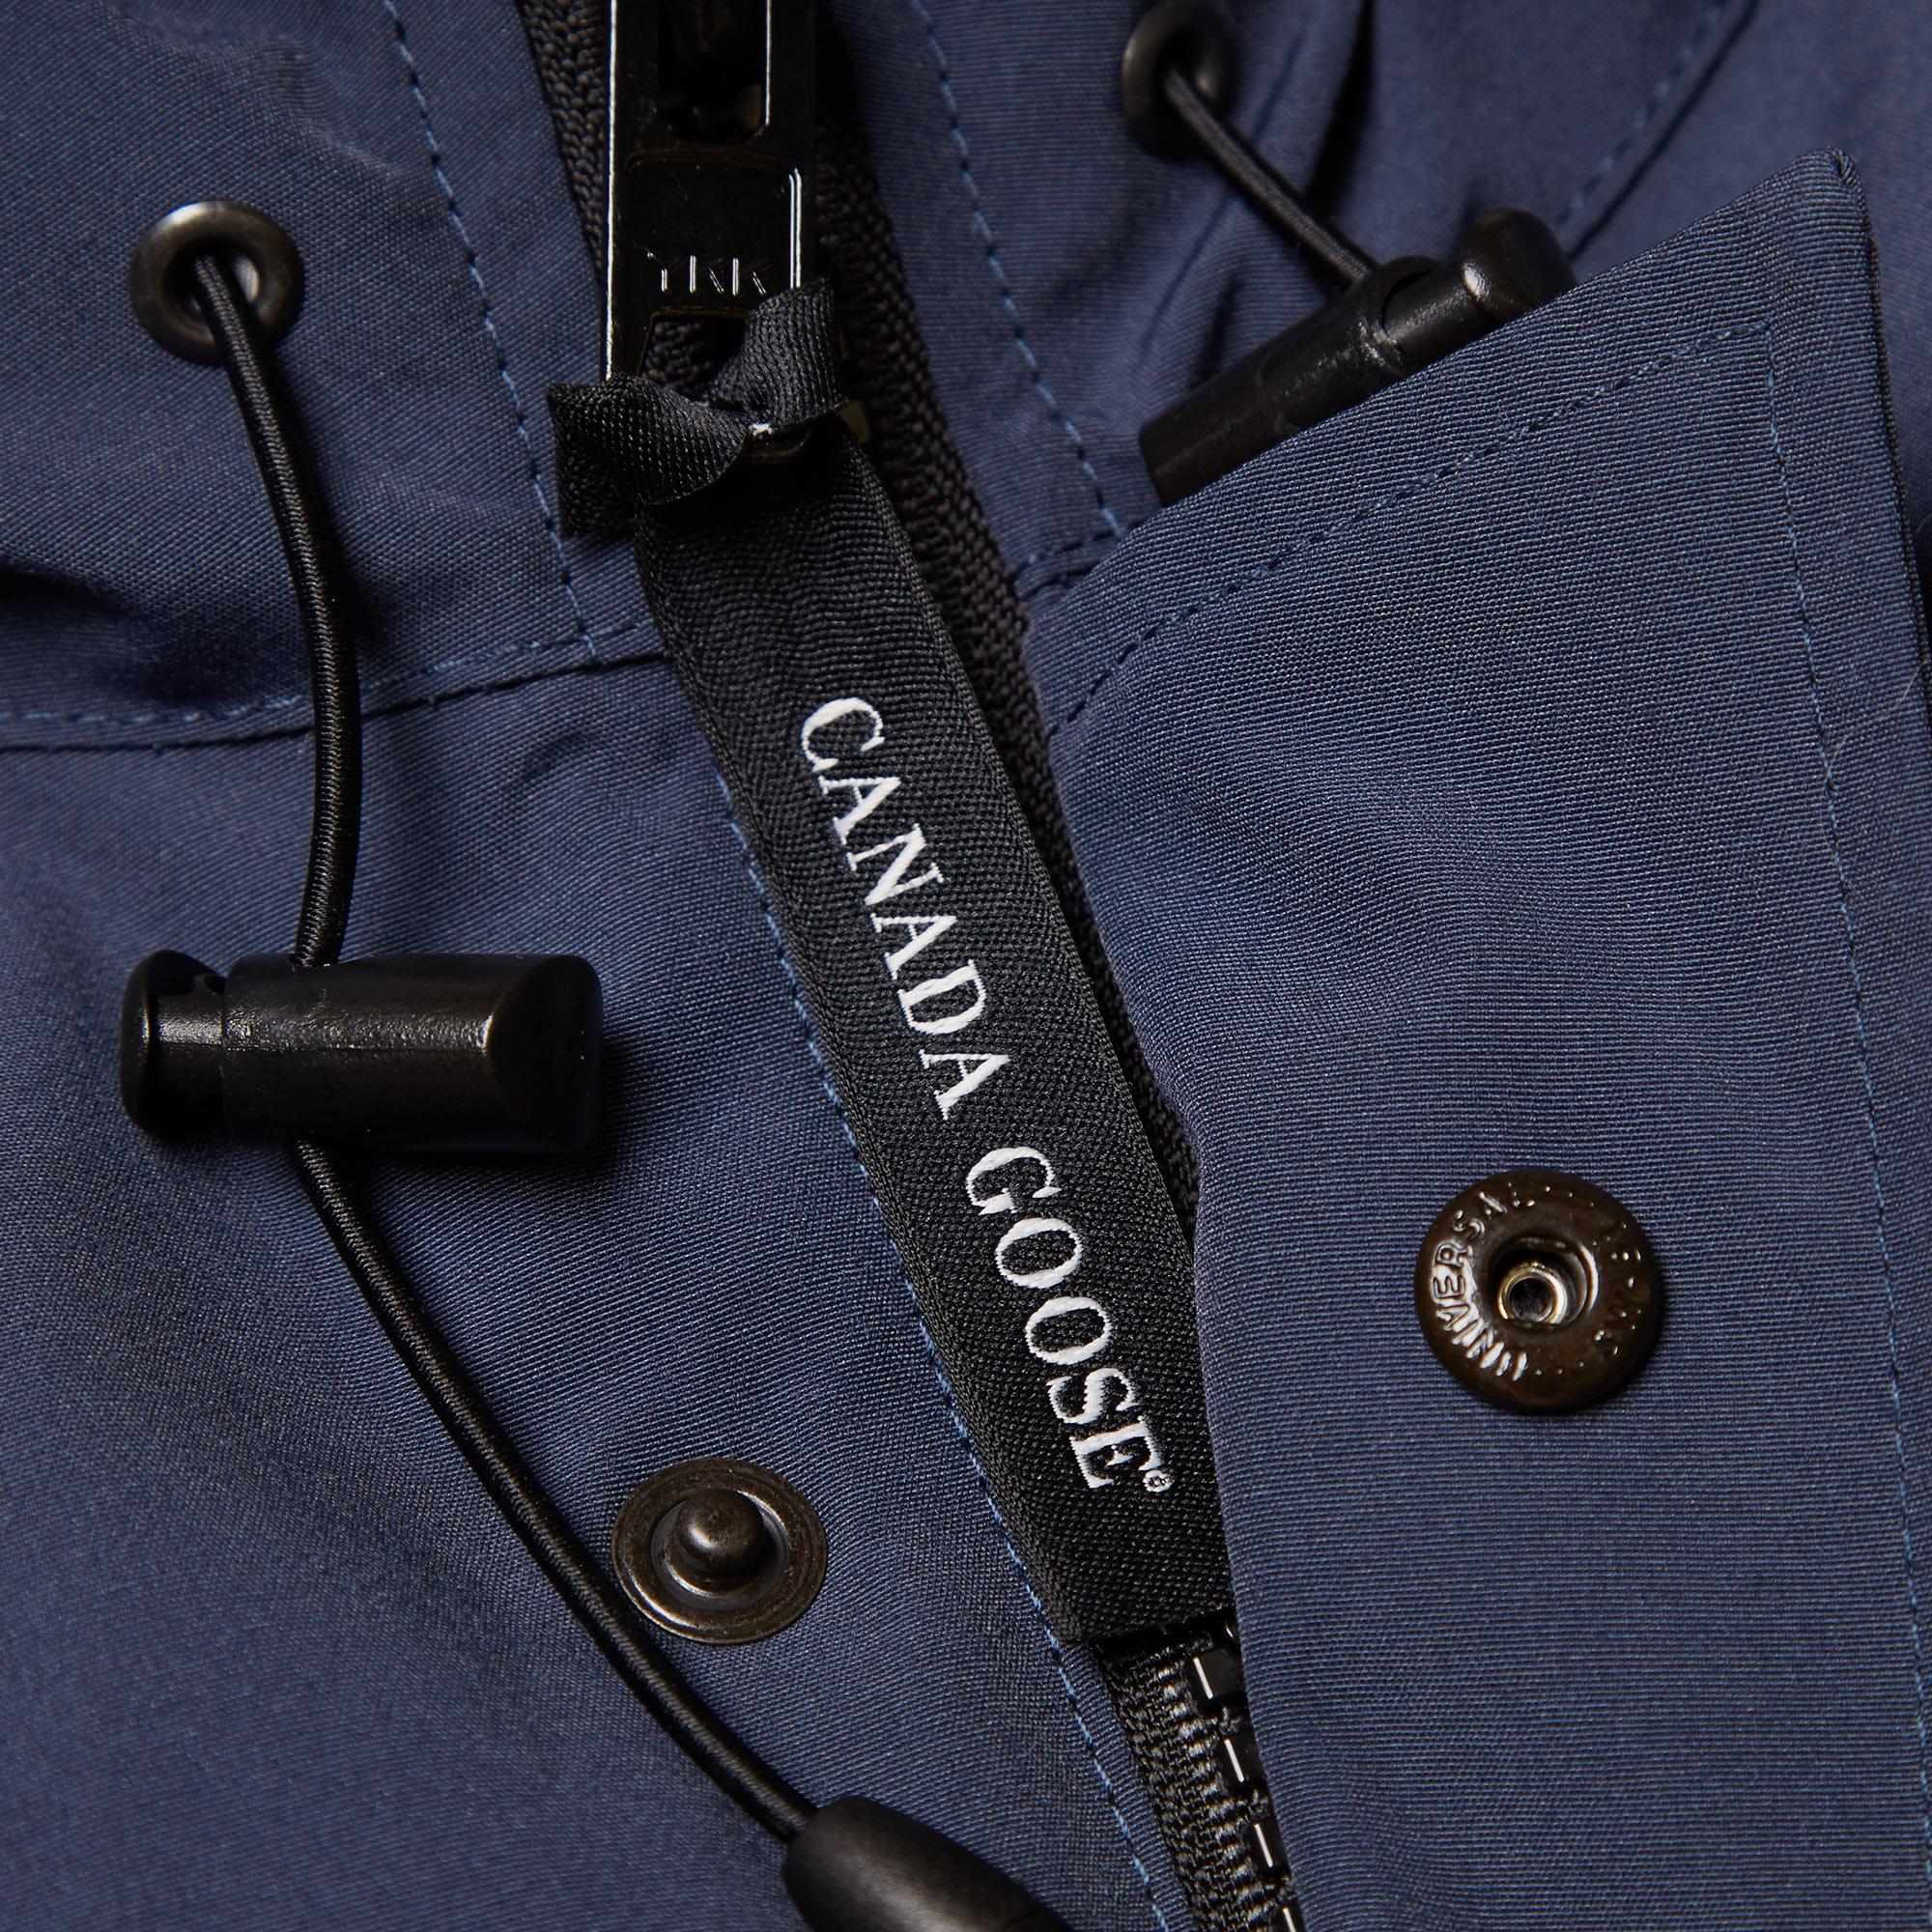 canada goose jacket denver